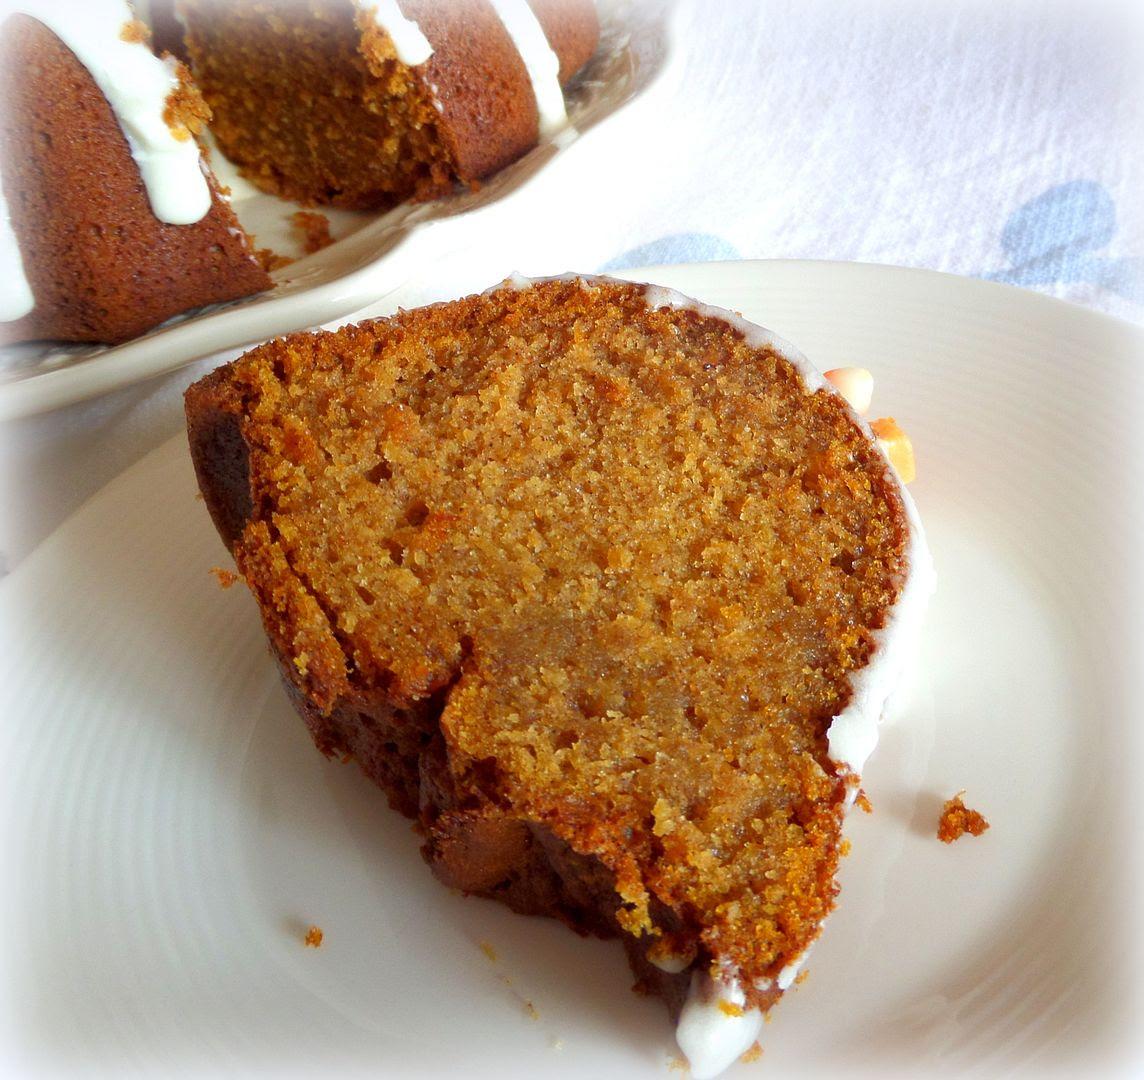 Cinderella's Pumpkin Cake